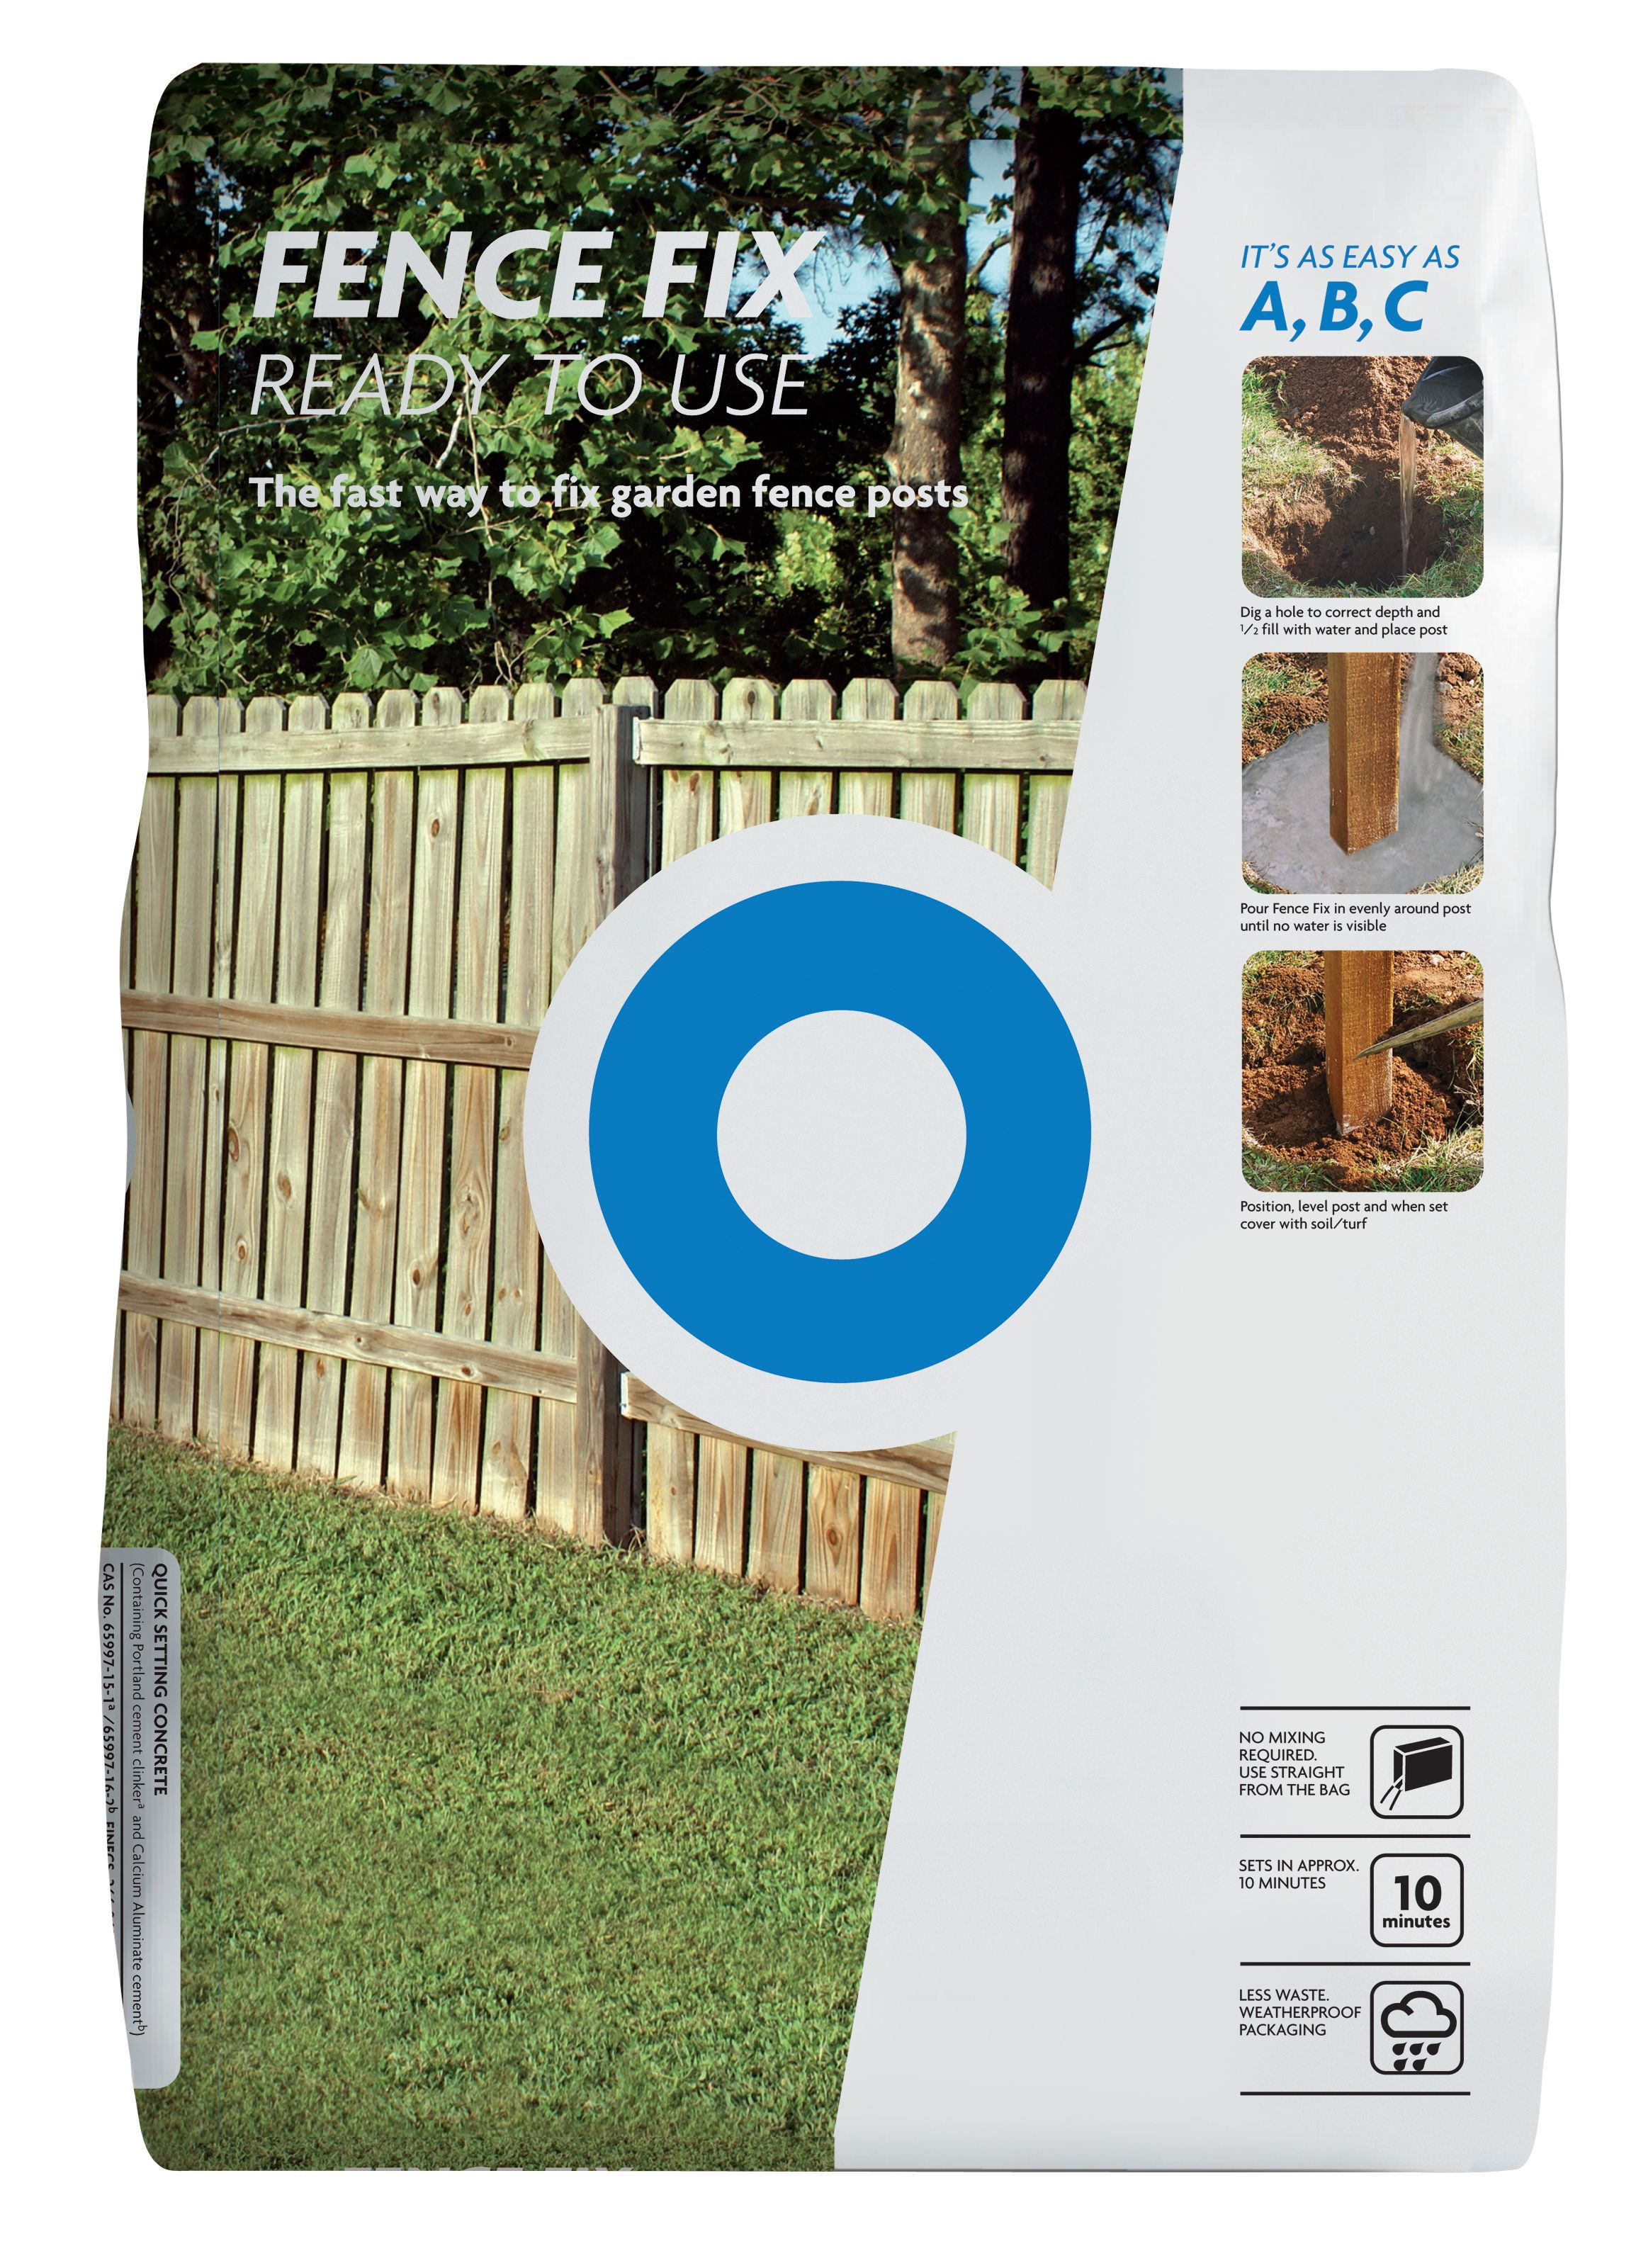 artex easifix exterior render repair kit reviews. blue circle ready to use fence fix 20kg artex easifix exterior render repair kit reviews